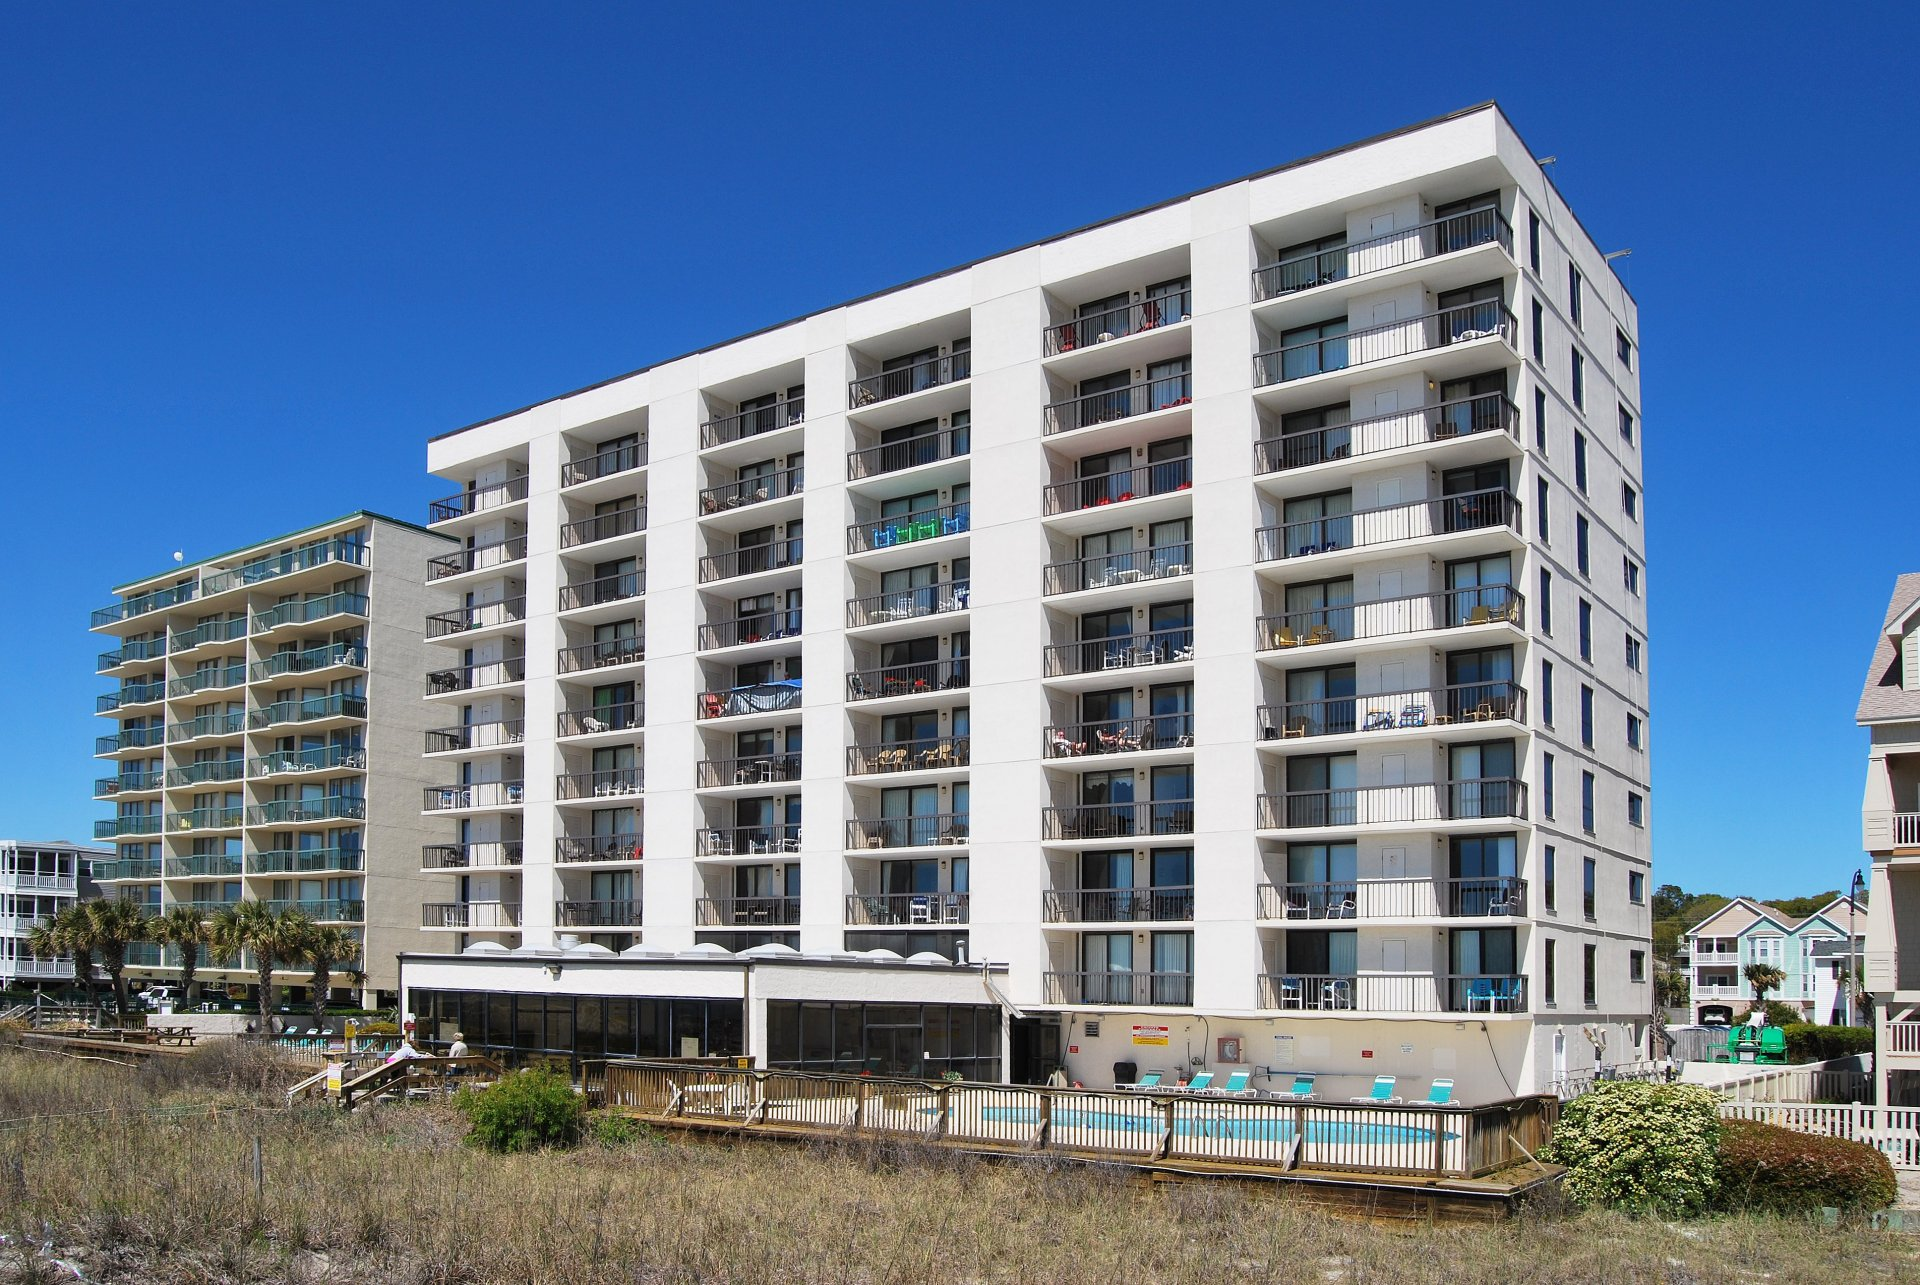 Waterpointe Ii 2 Condo Rentals North Myrtle Beach Sc